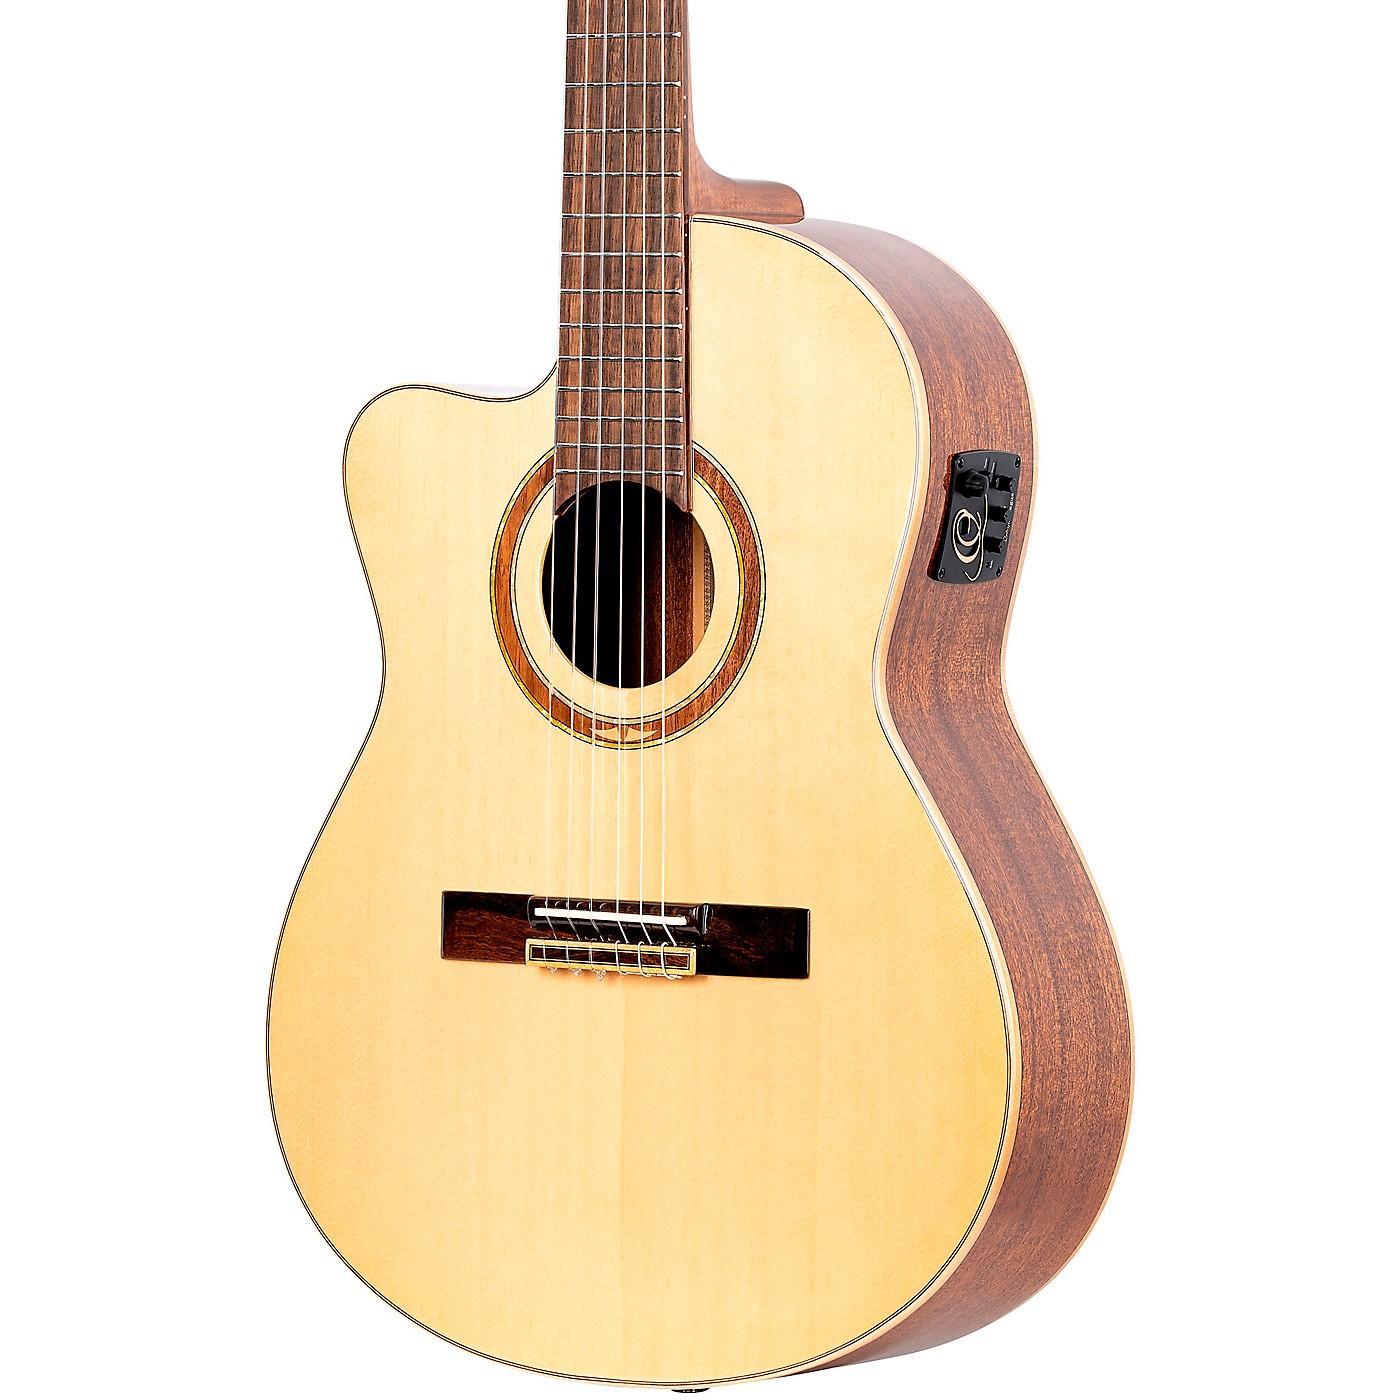 Ortega Family Series Pro RCE138-T4-L Thinline Acoustic Electric Nylon Guitar thumbnail